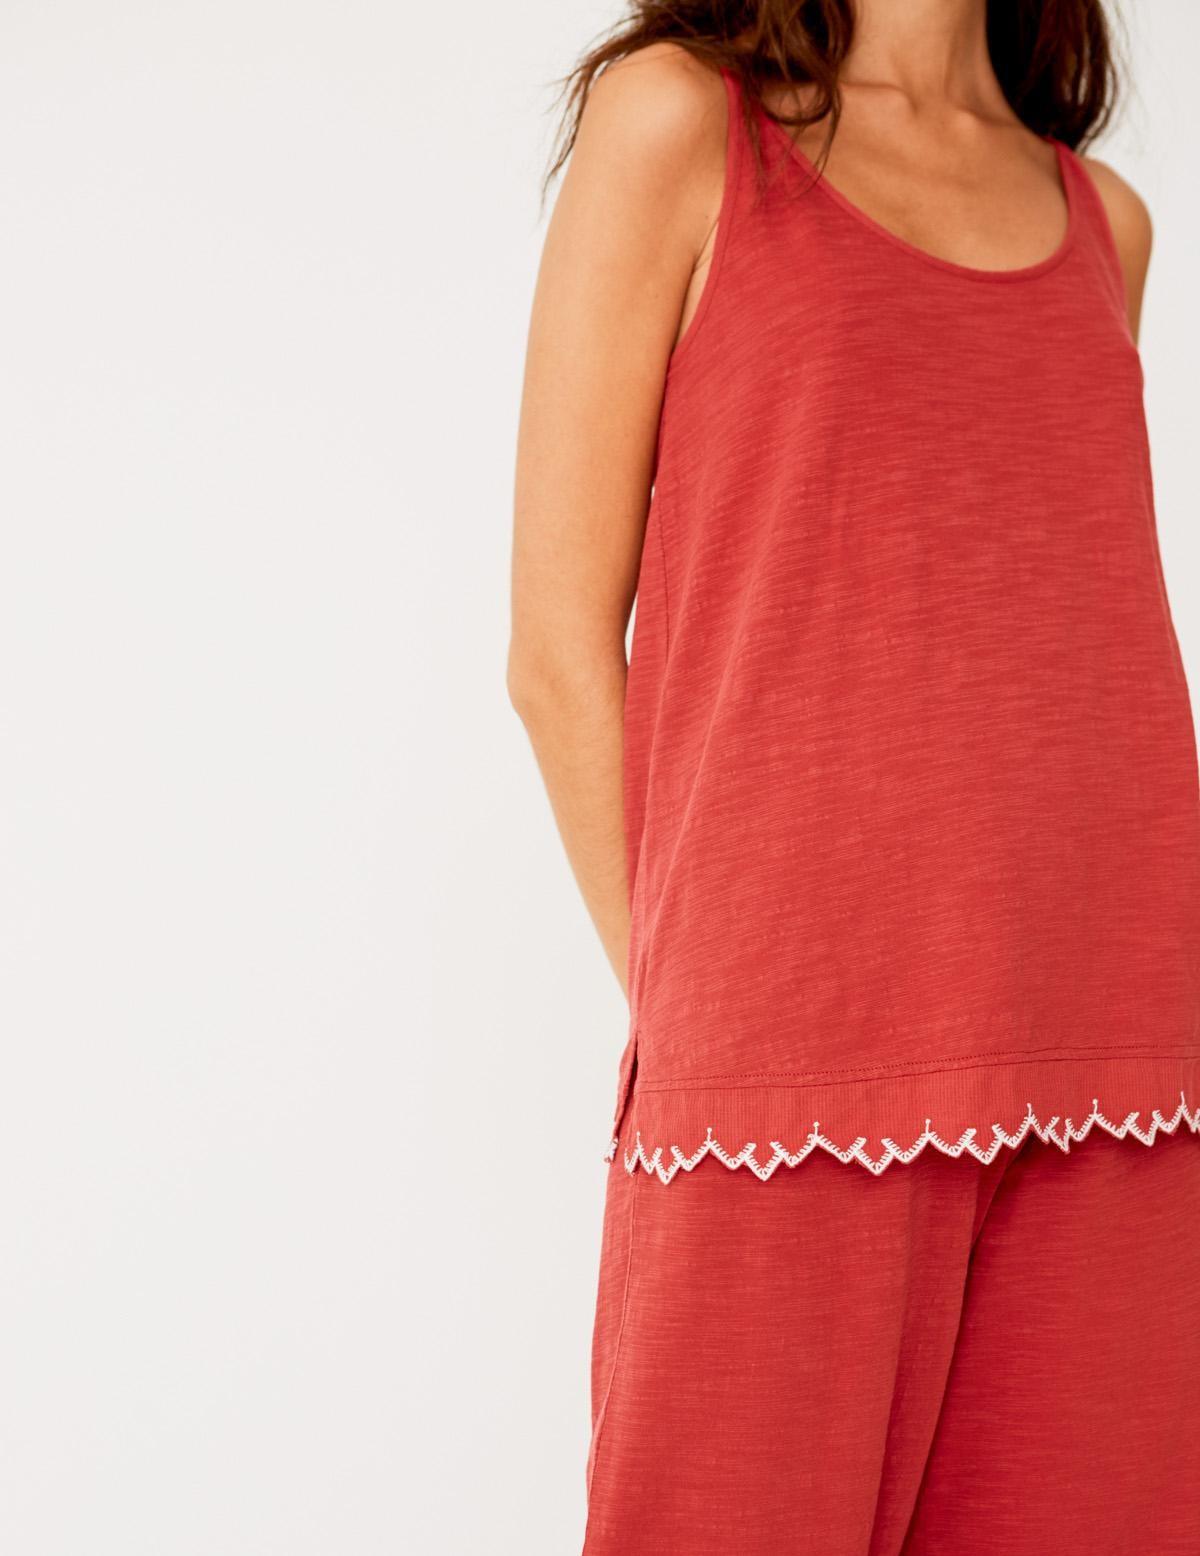 Camiseta puntilla bordada - Ítem2